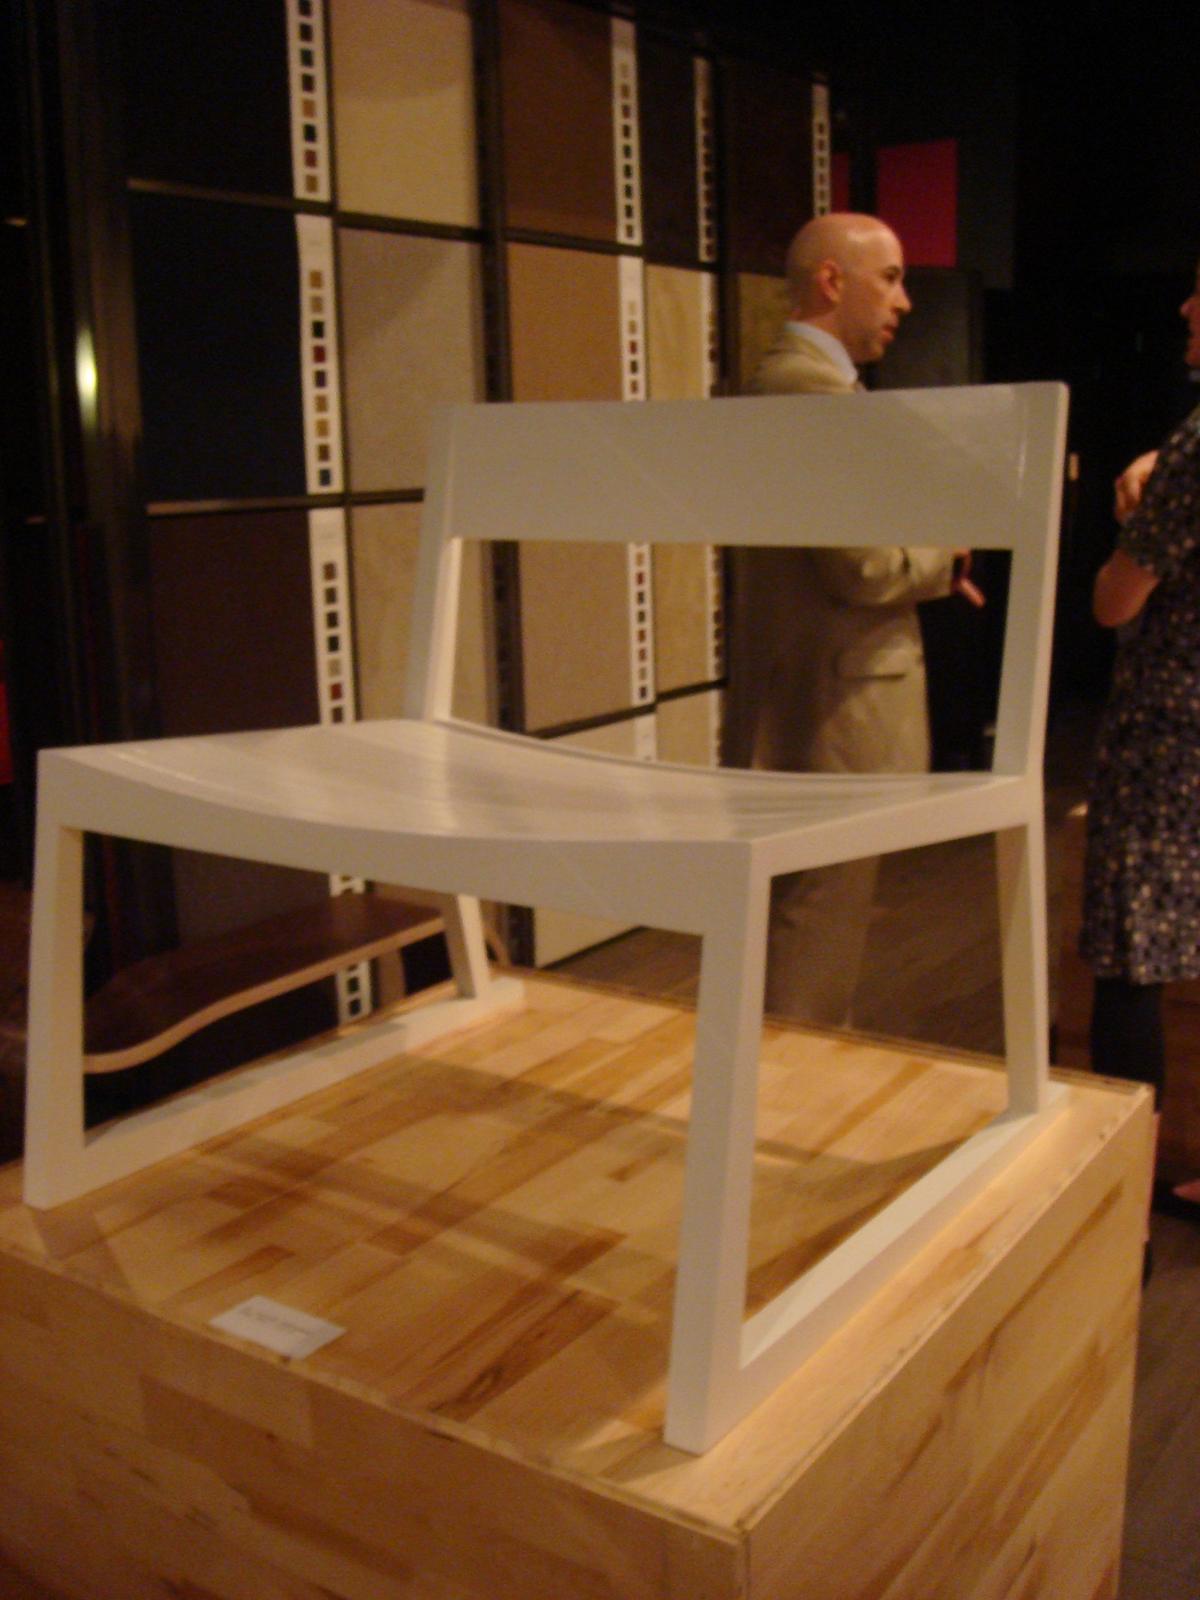 "The Husky Chair, by designer <a href=""http://www.od-design.com/Husky%20OD.htm"">Olivier Desrochers</a>."